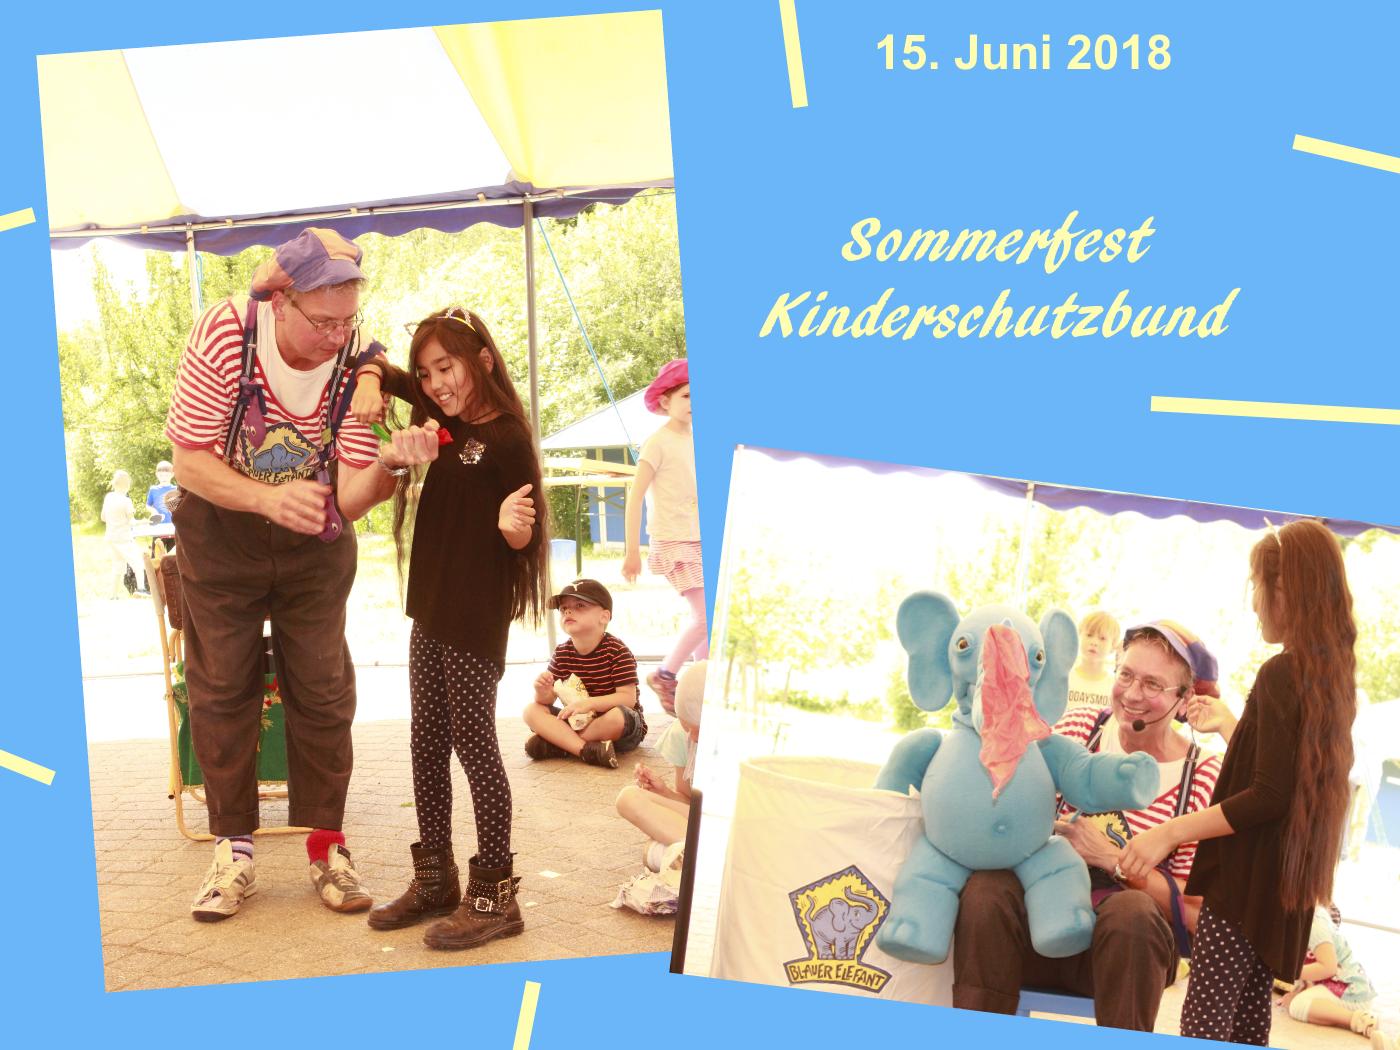 15.06.18 - Sommerfest des Kinderschutzbundes